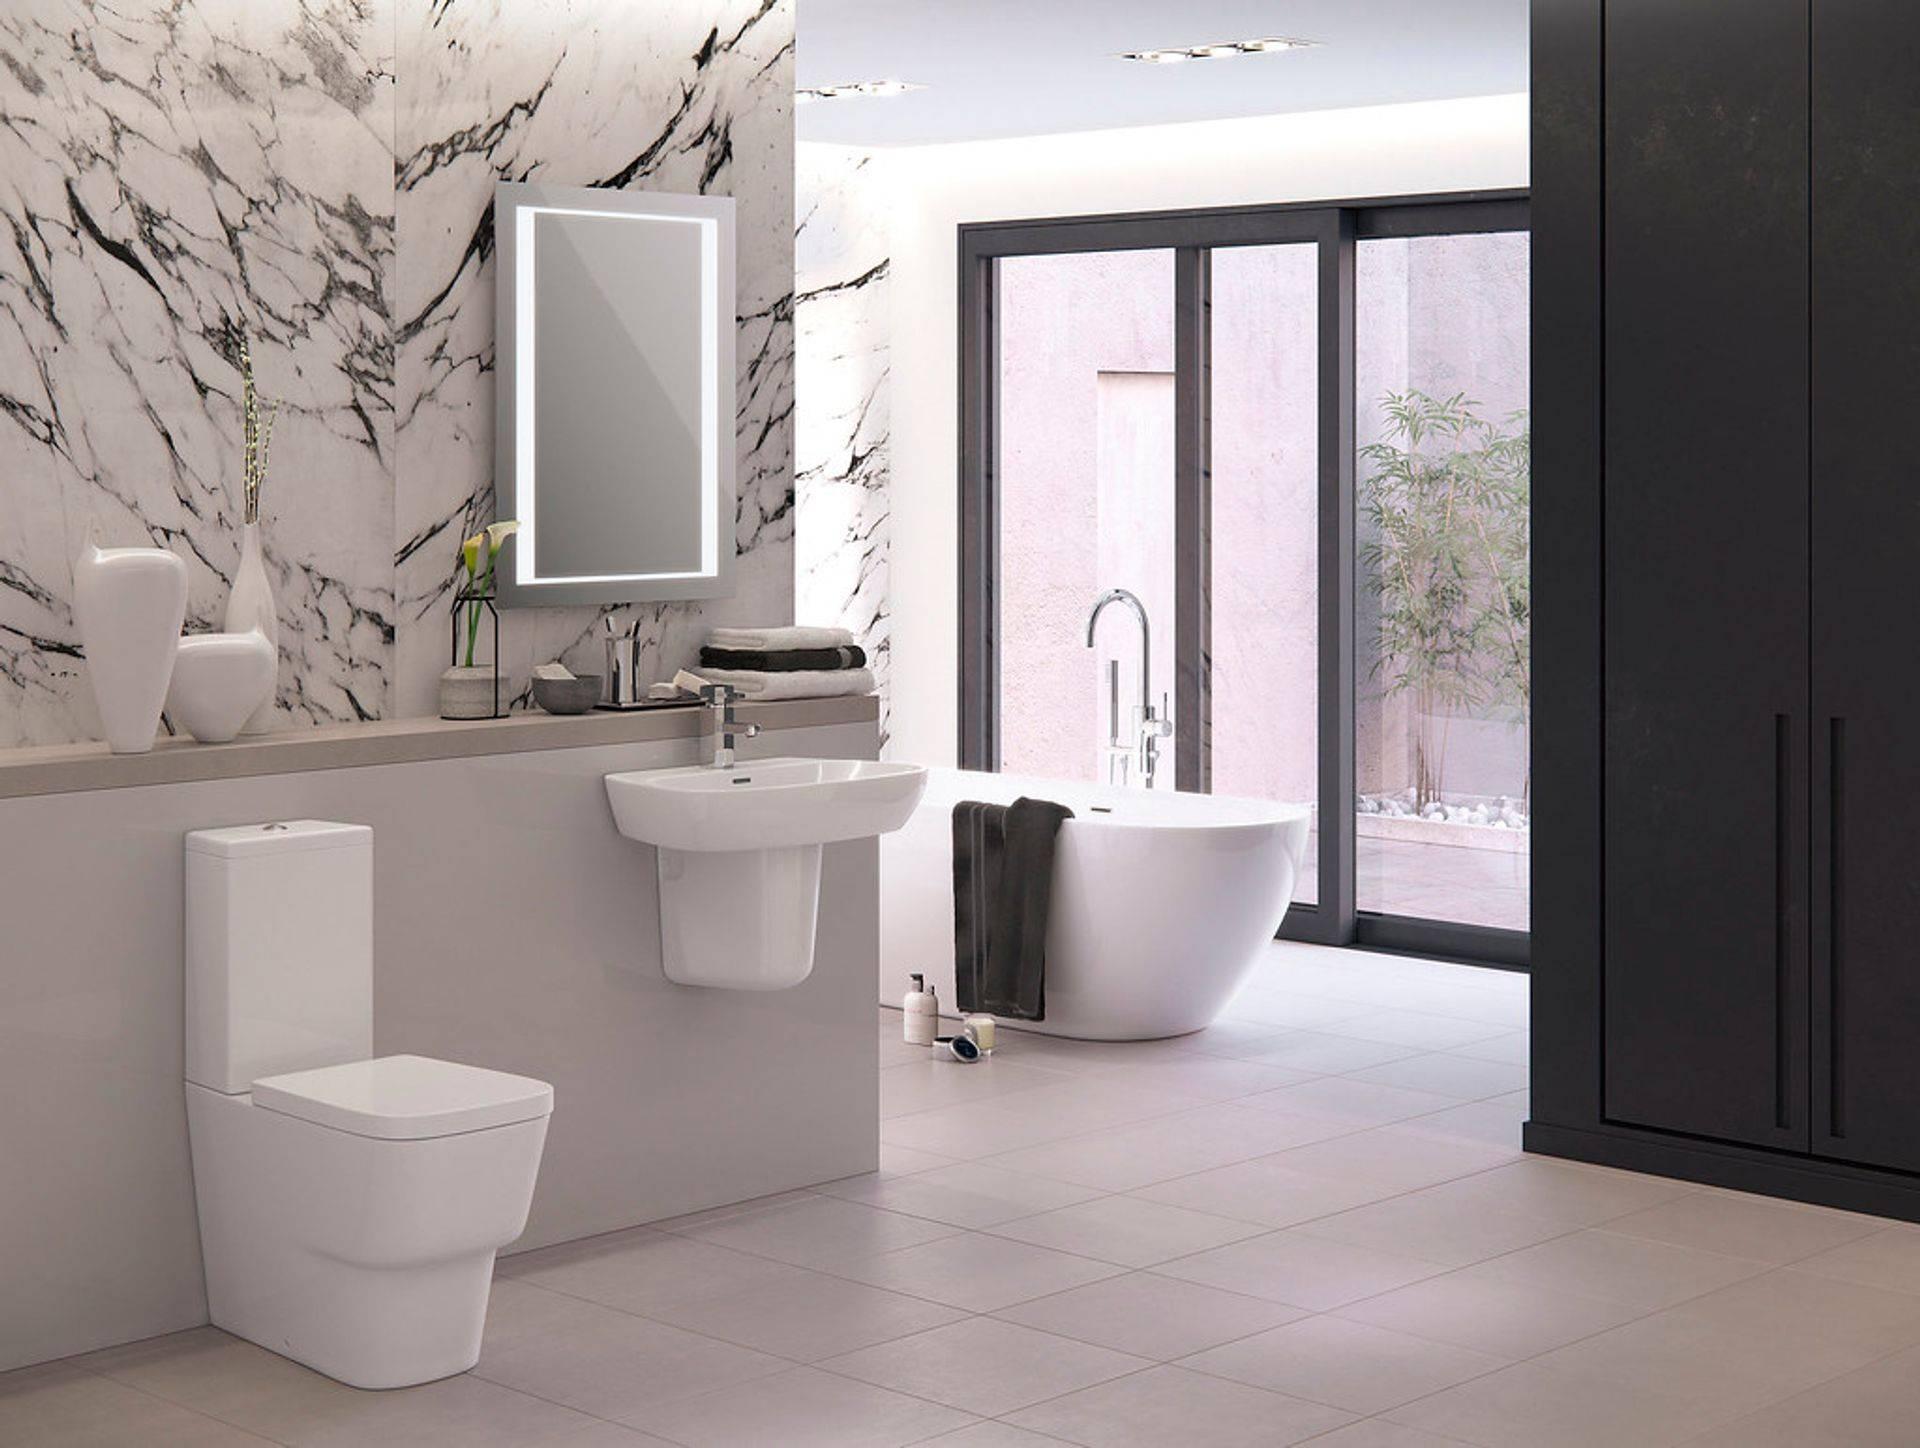 Elegant and sophisticated bathroom suites